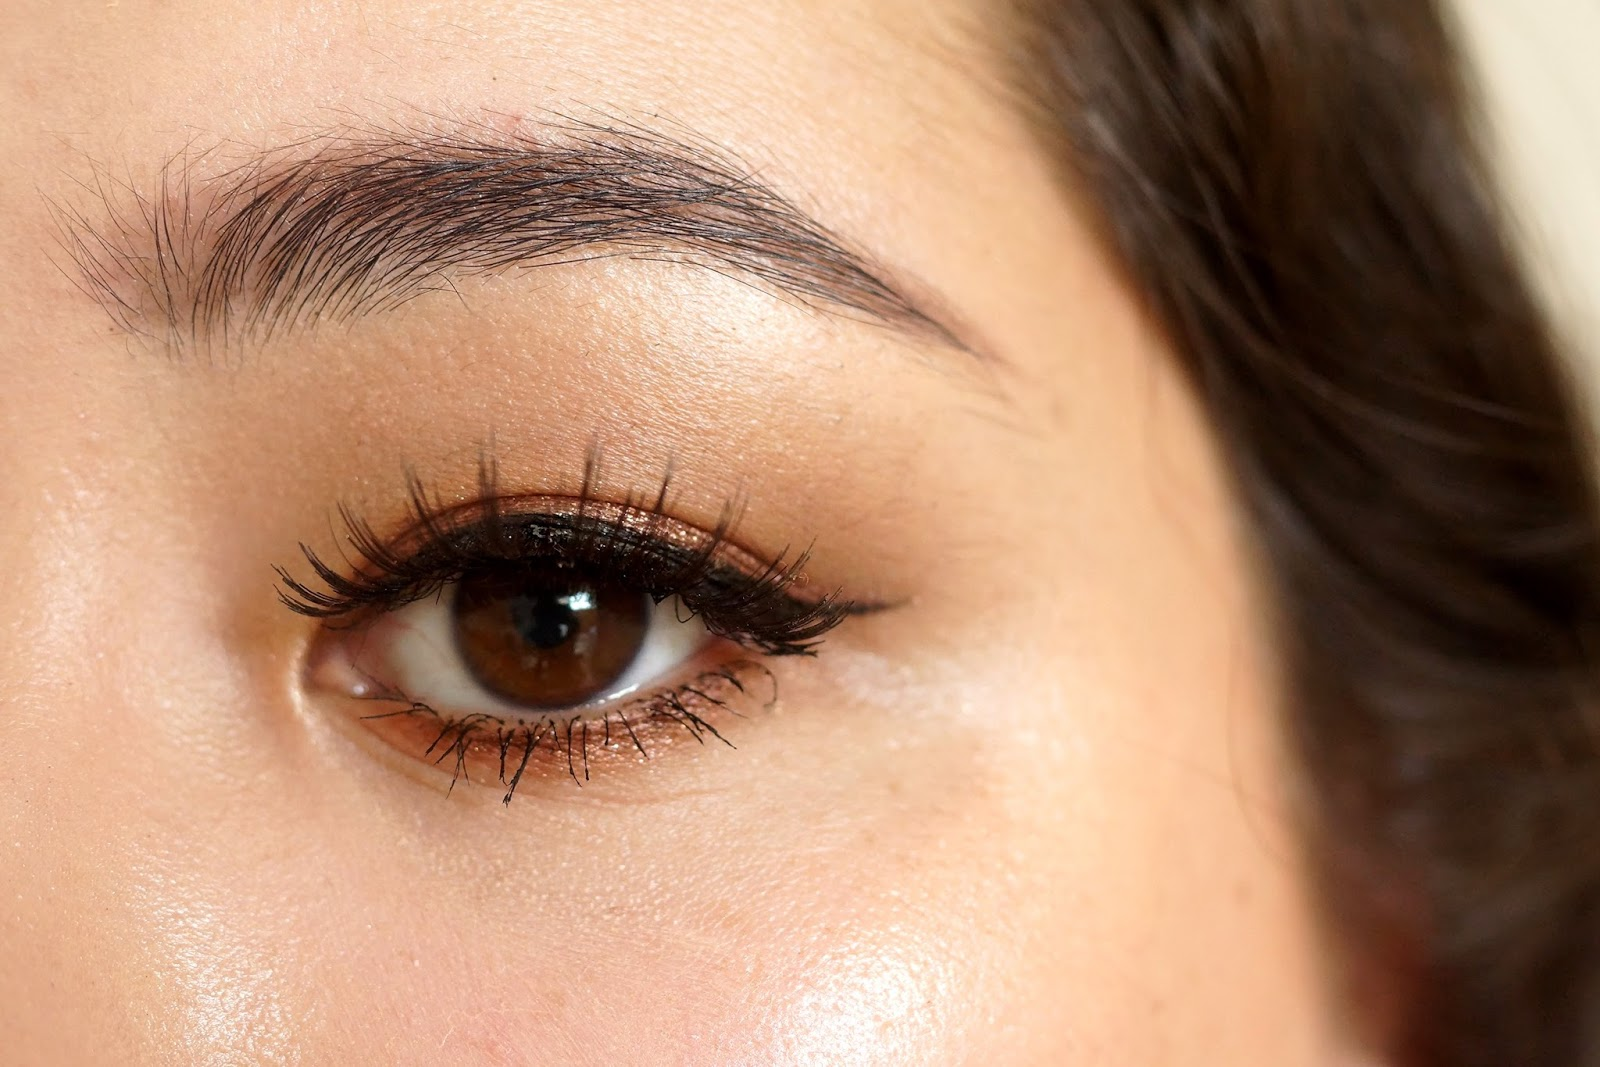 Asian hooded eye makeup